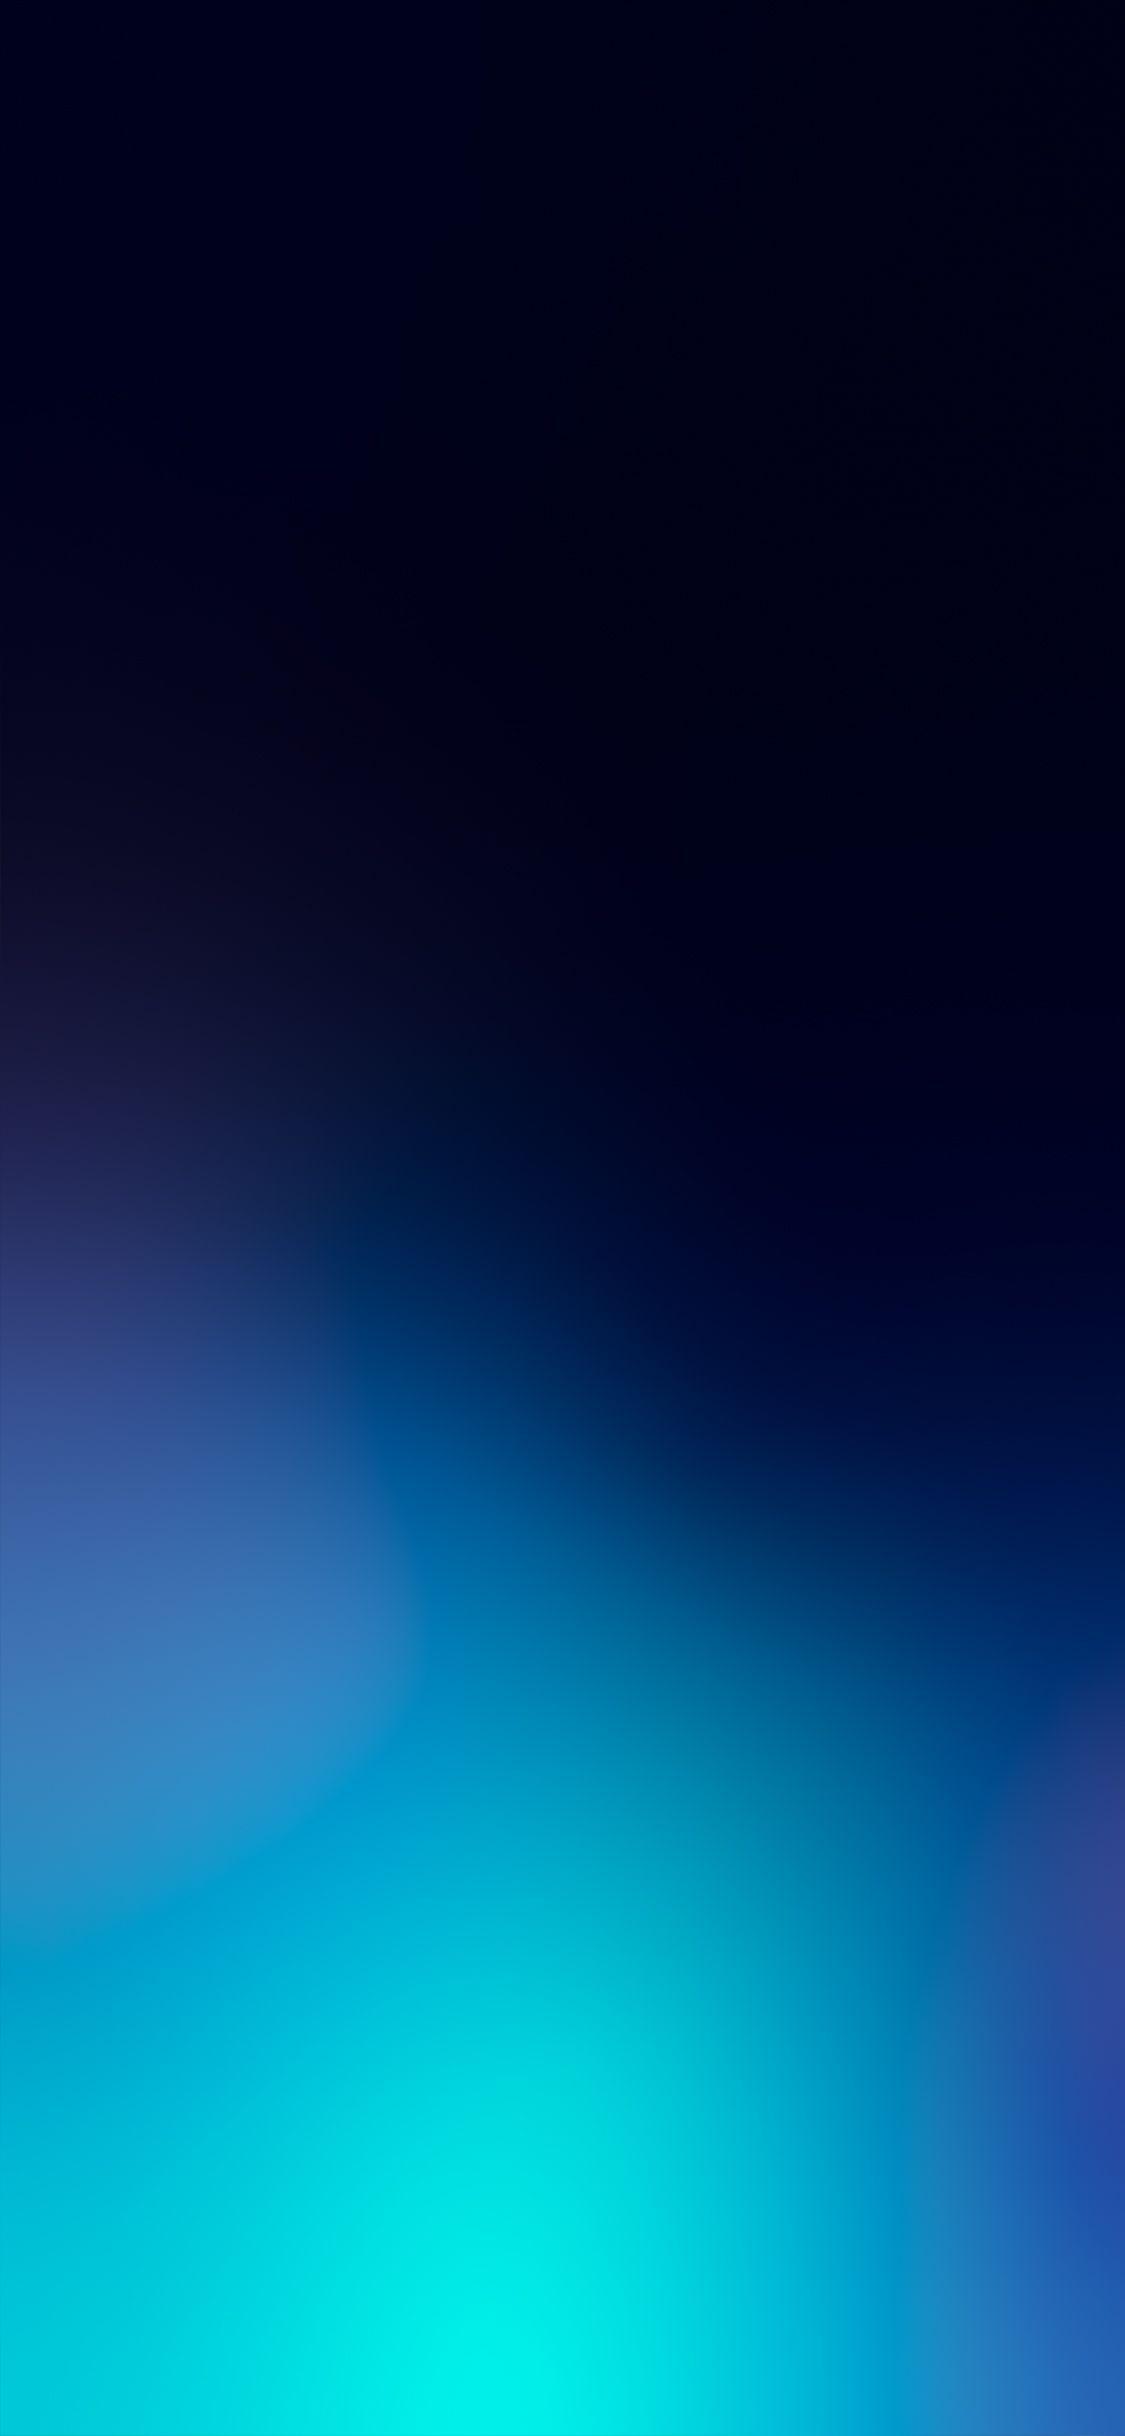 Simple Blue Gradient By Hk3ton Black Wallpaper Iphone Dark Blue Wallpaper Iphone Wallpaper Bright